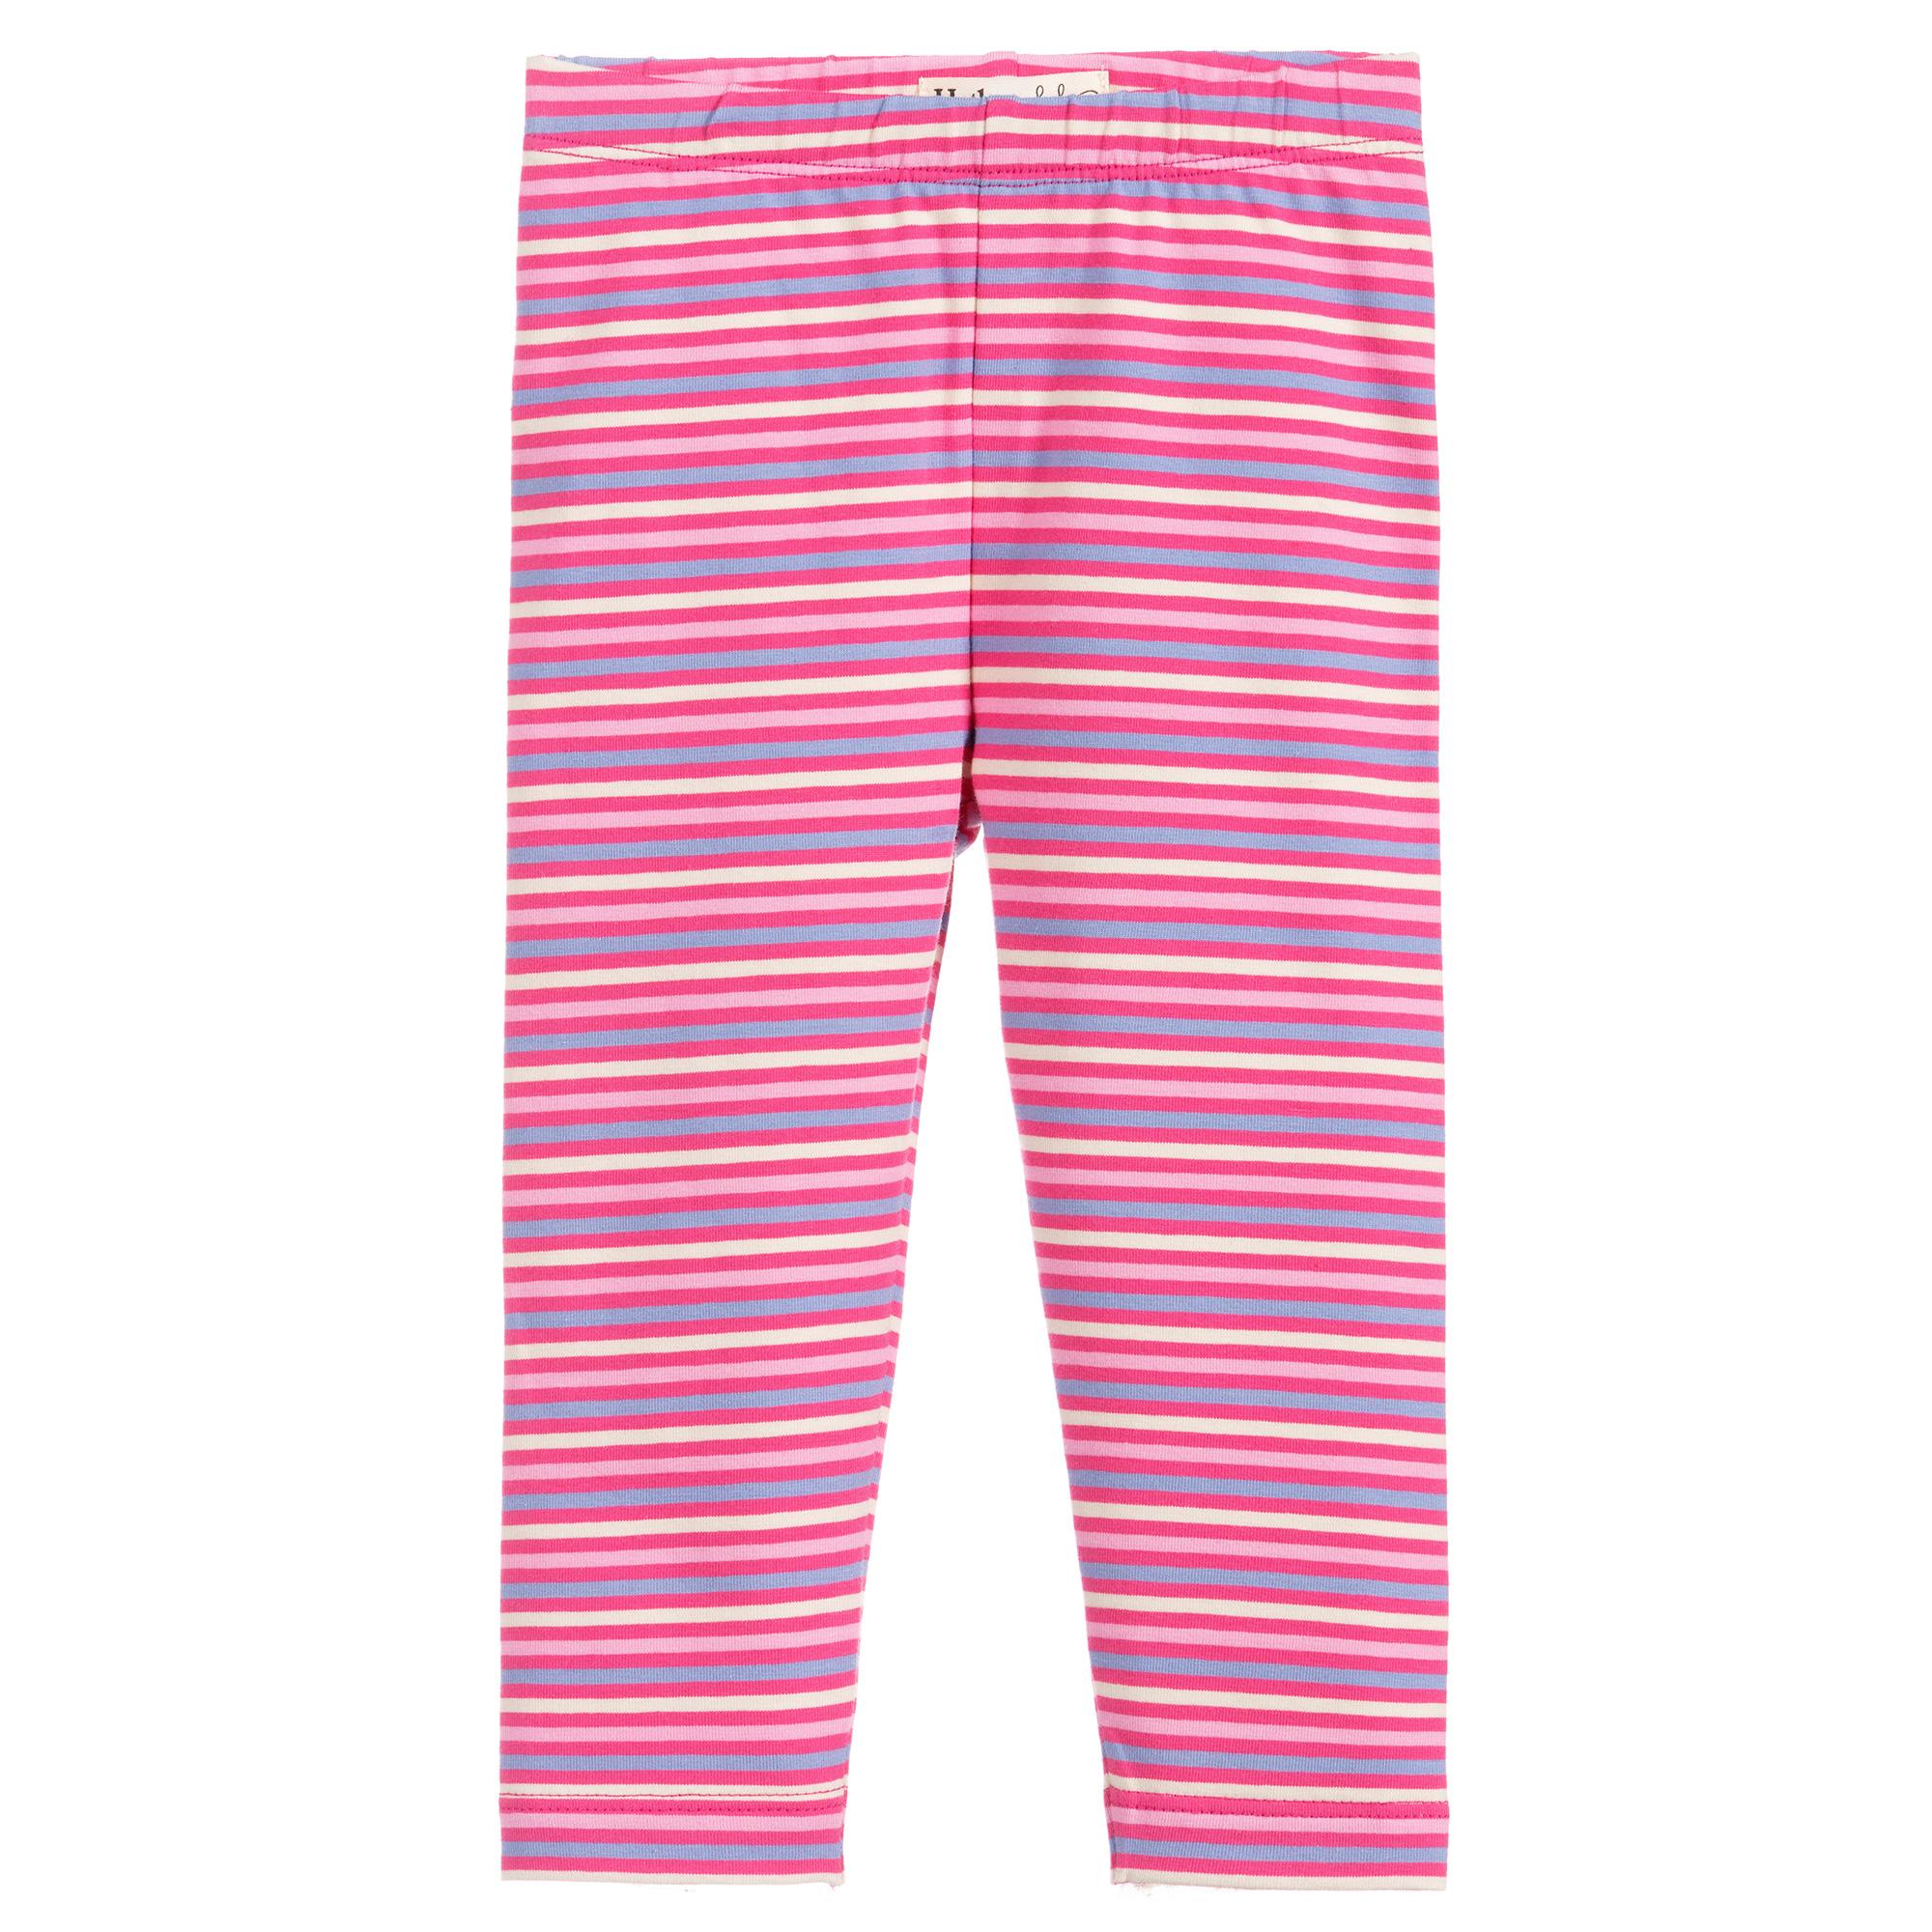 Hatley Stripes Baby Leggings-Rose (was £16)